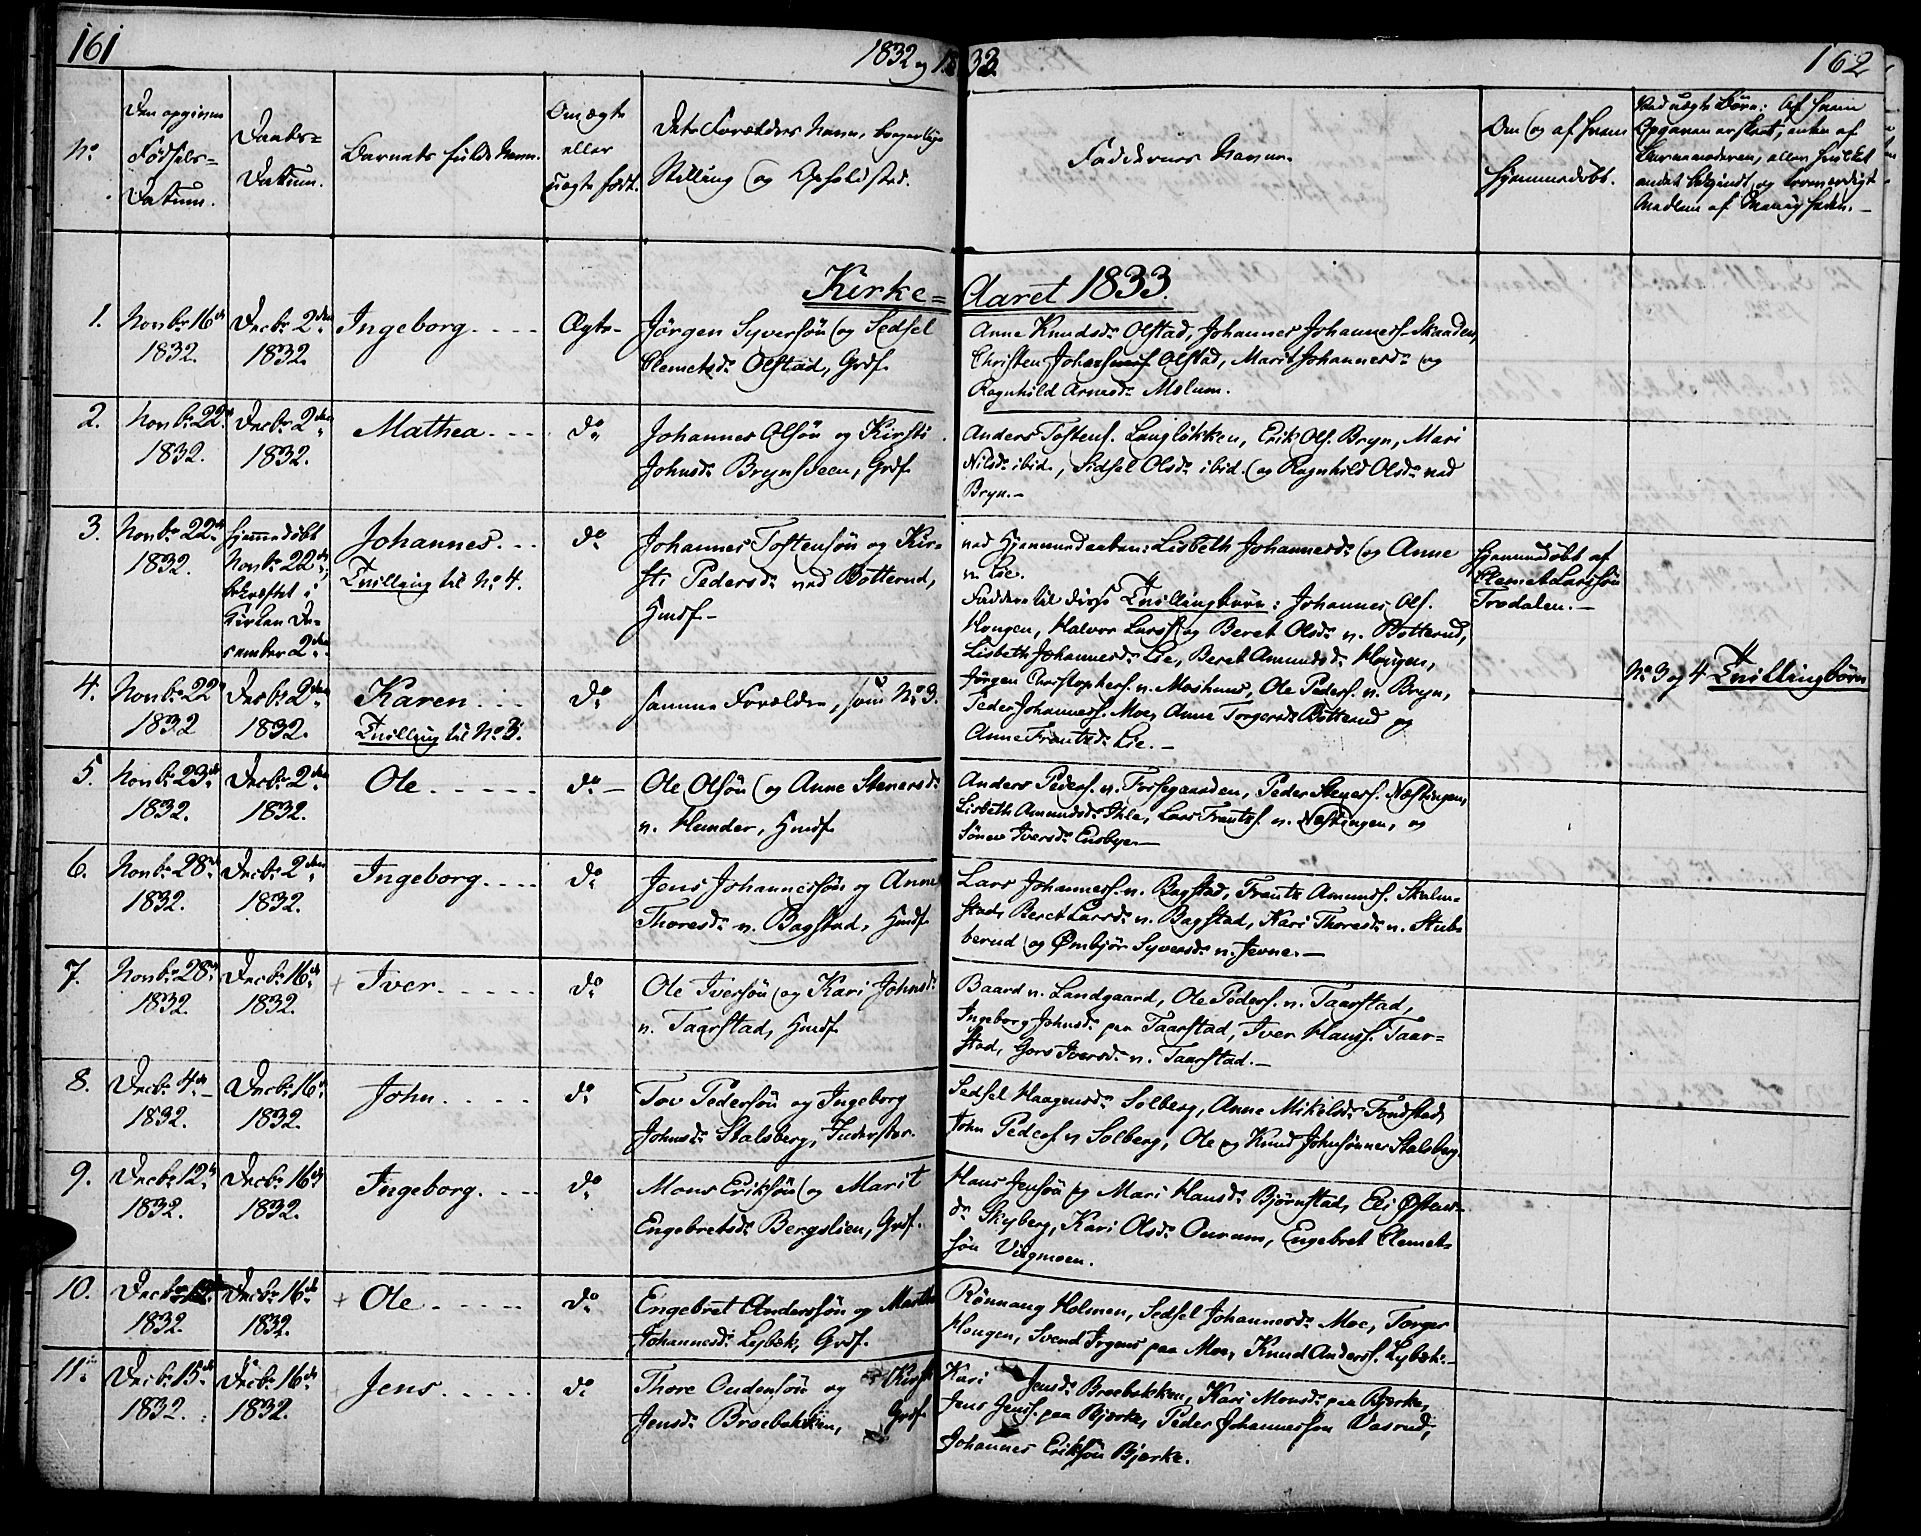 SAH, Øyer prestekontor, Ministerialbok nr. 4, 1824-1841, s. 161-162